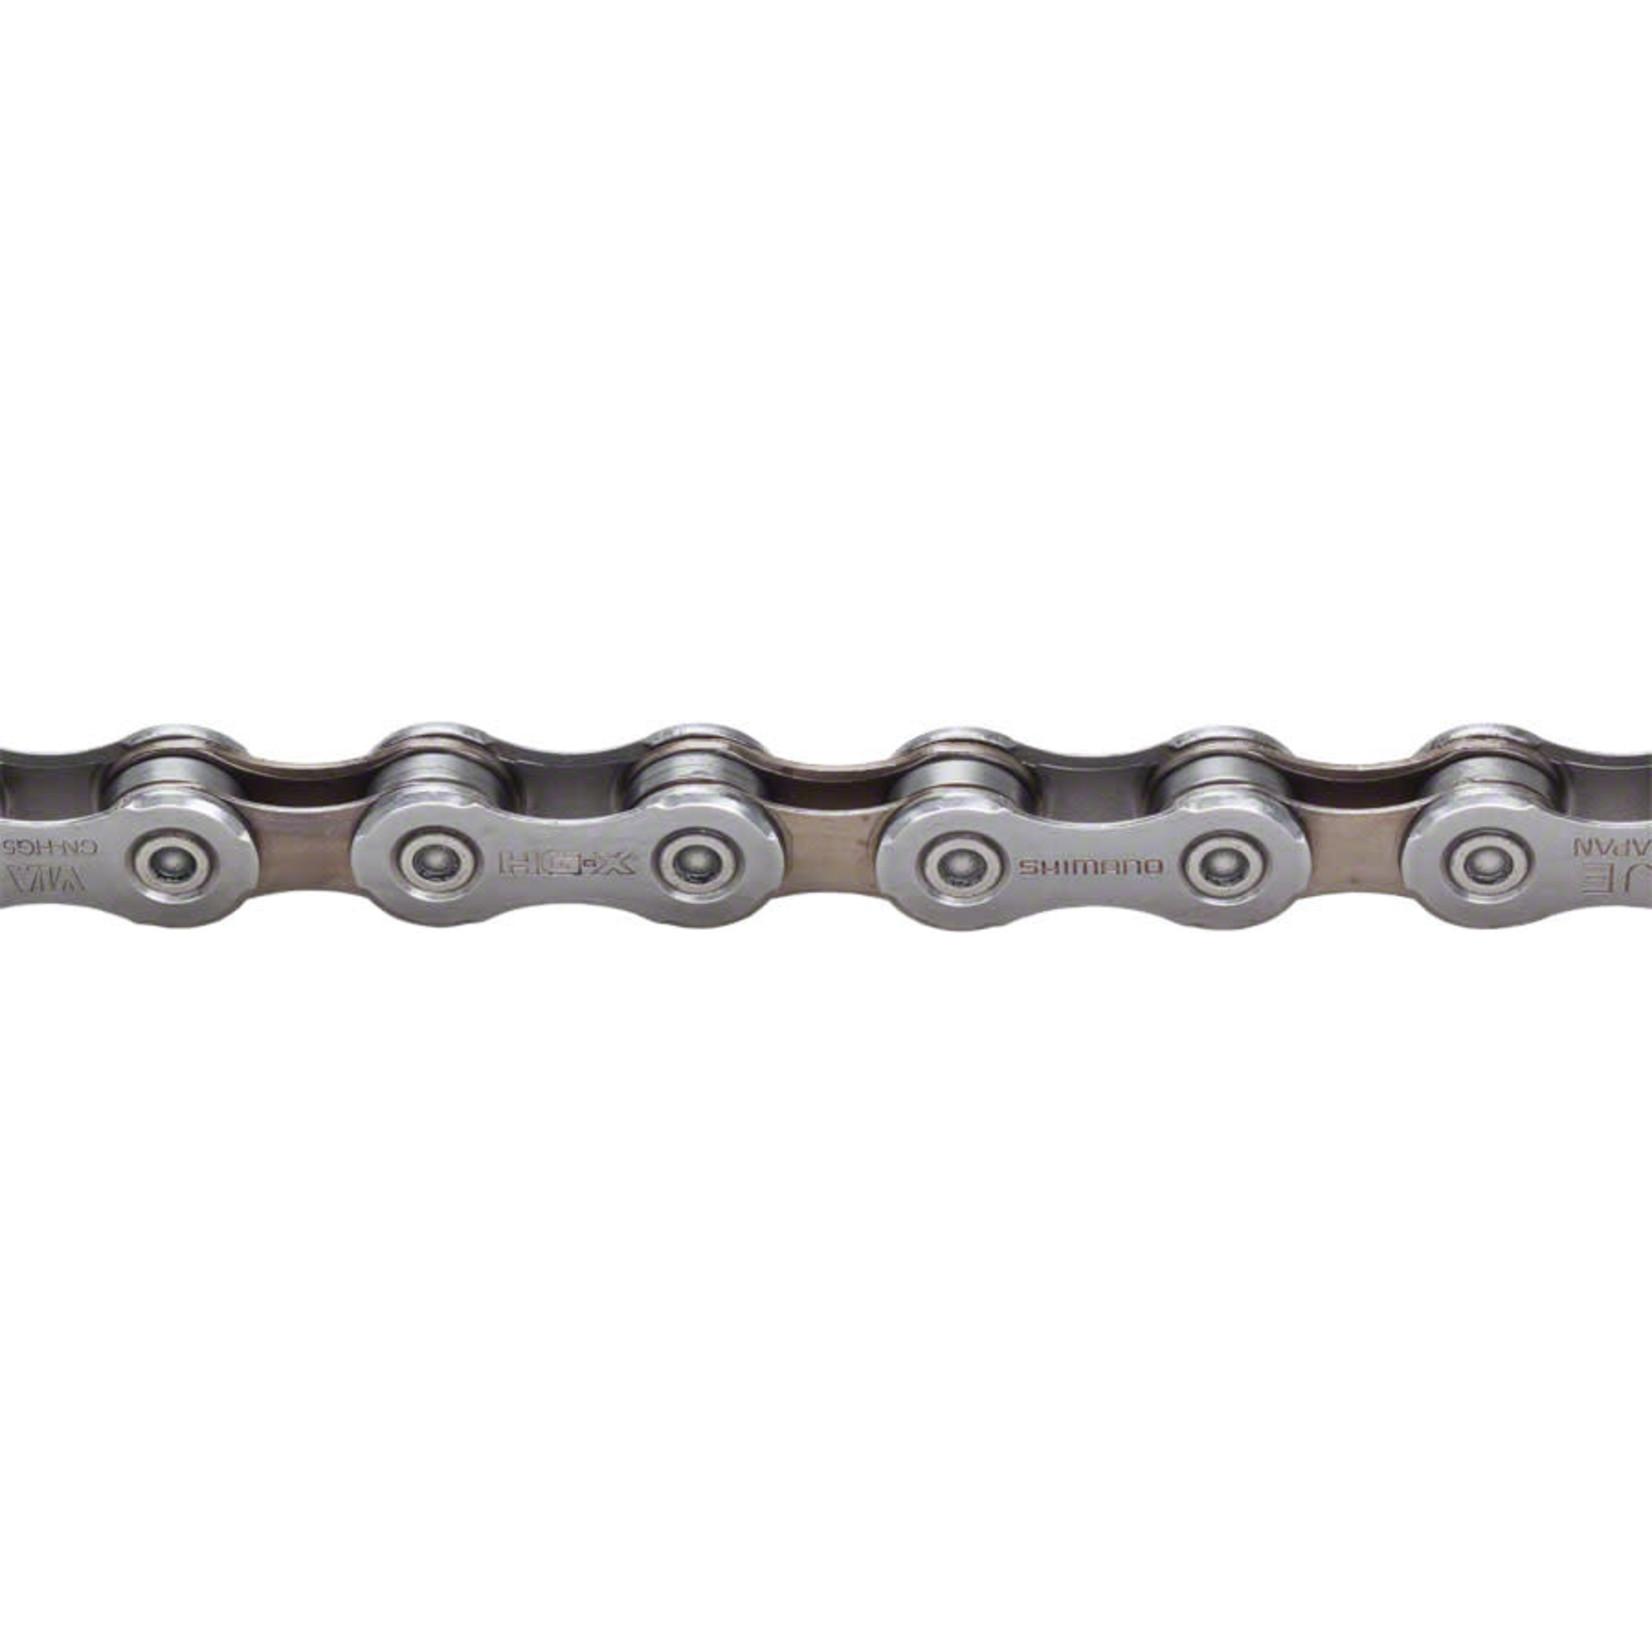 Shimano Shimano Deore CN - HG54 10-Speed Chain